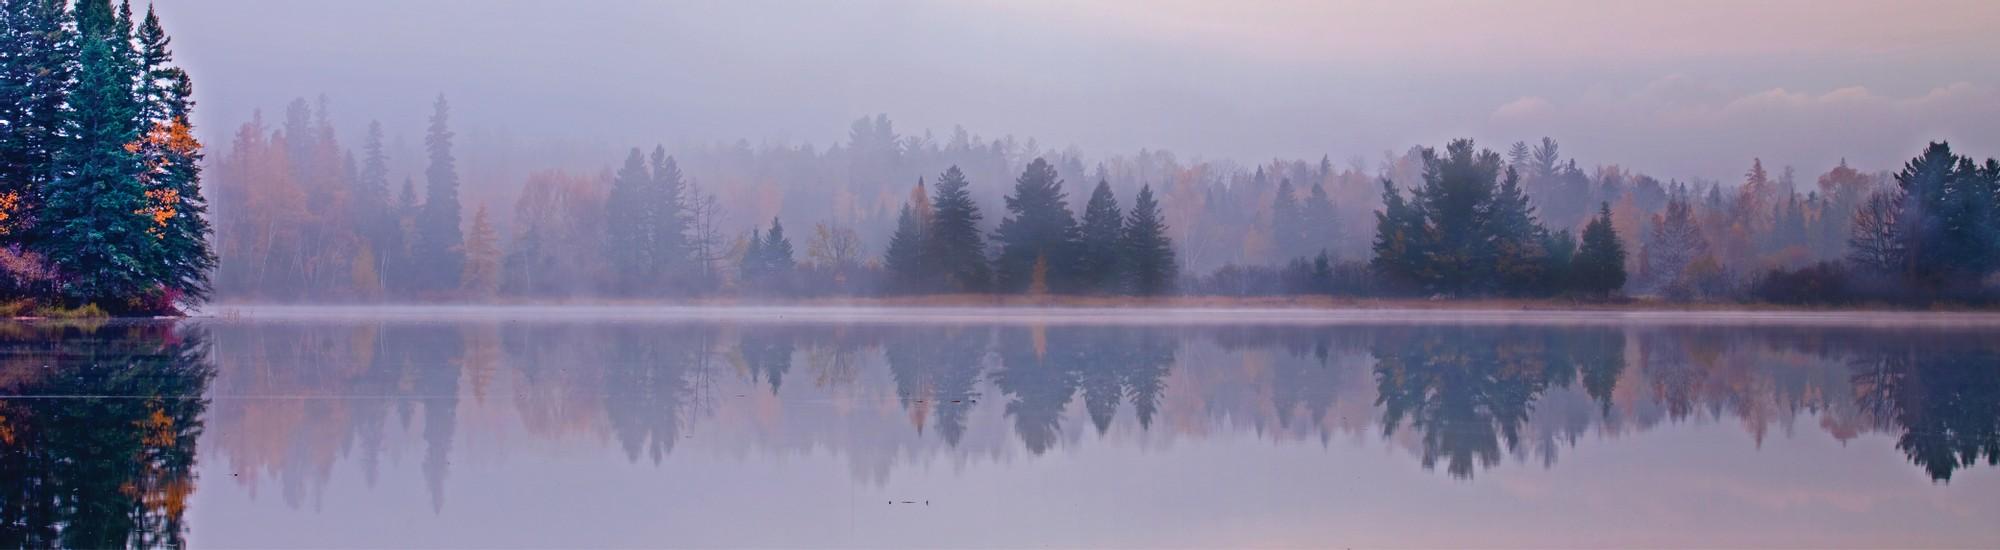 Misty pond with fir trees